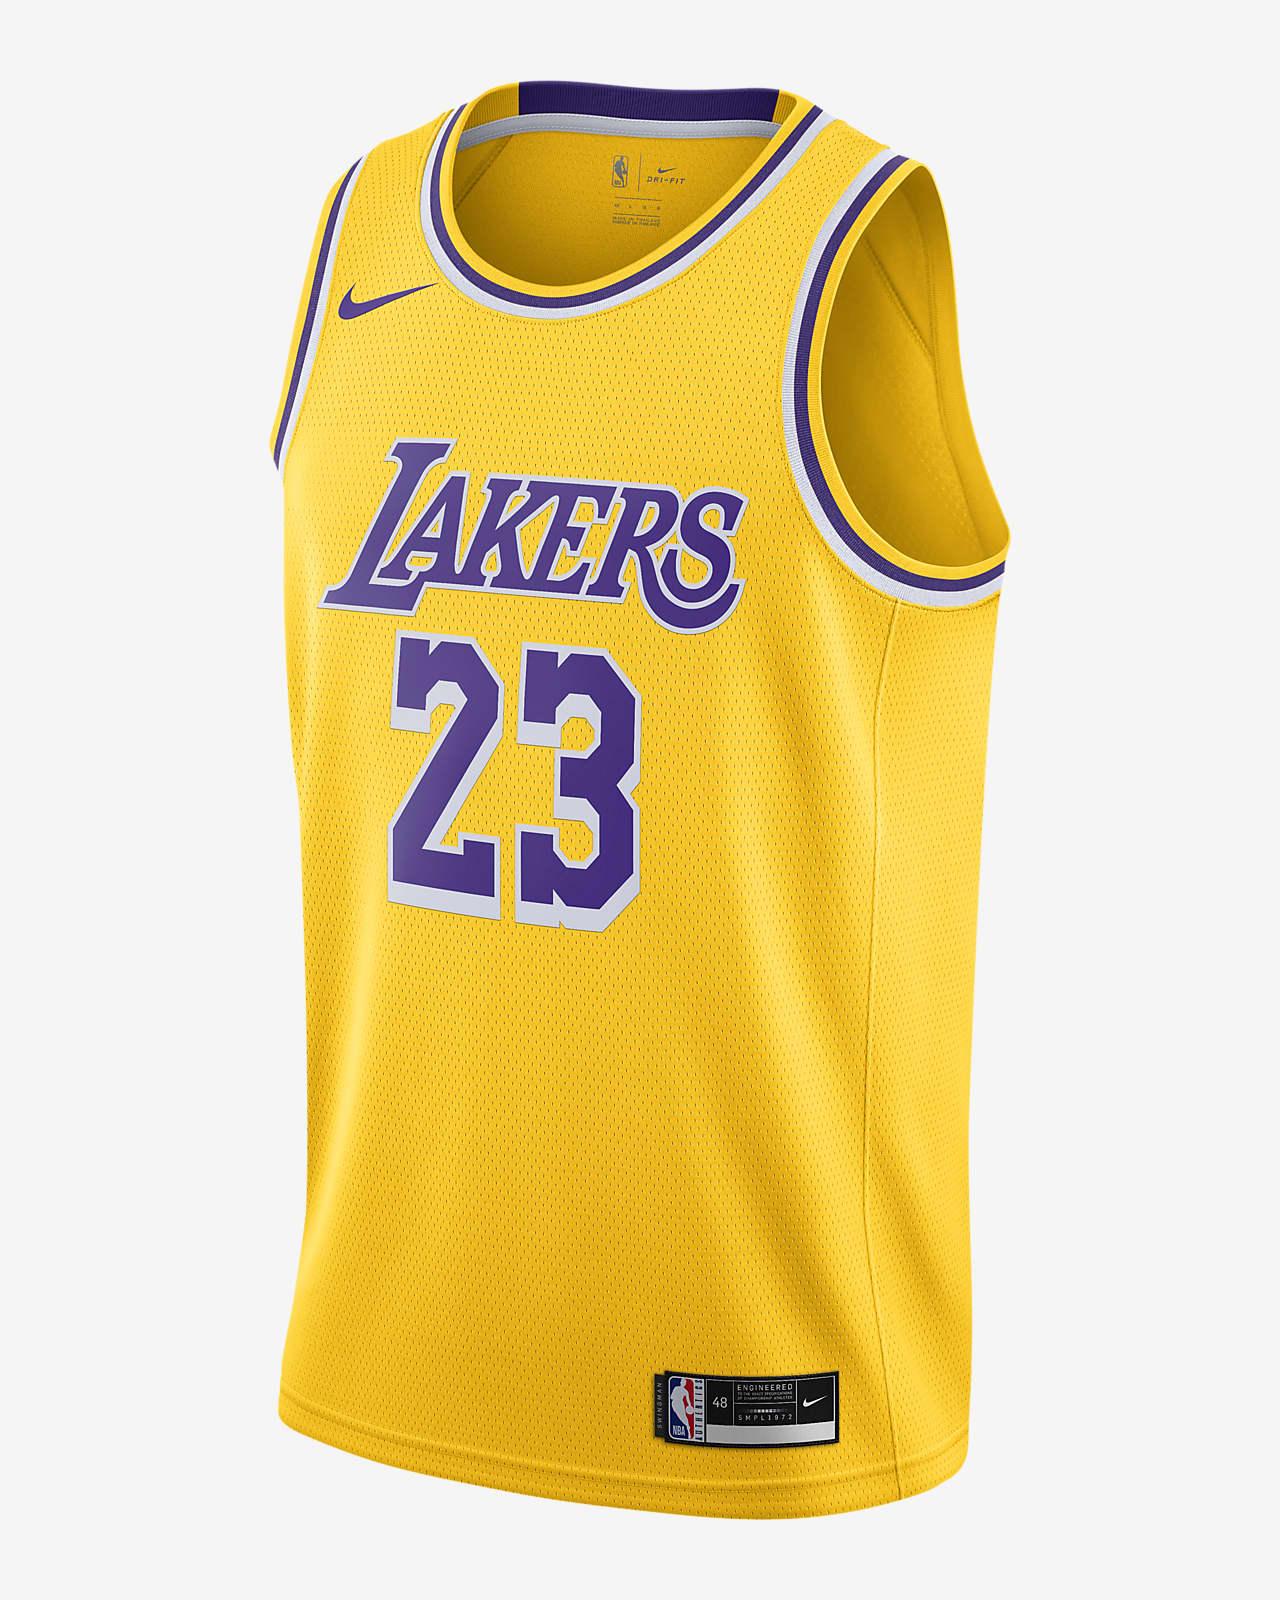 2020 赛季洛杉矶湖人队 (LeBron James) Icon Edition Nike NBA Swingman Jersey 男子球衣